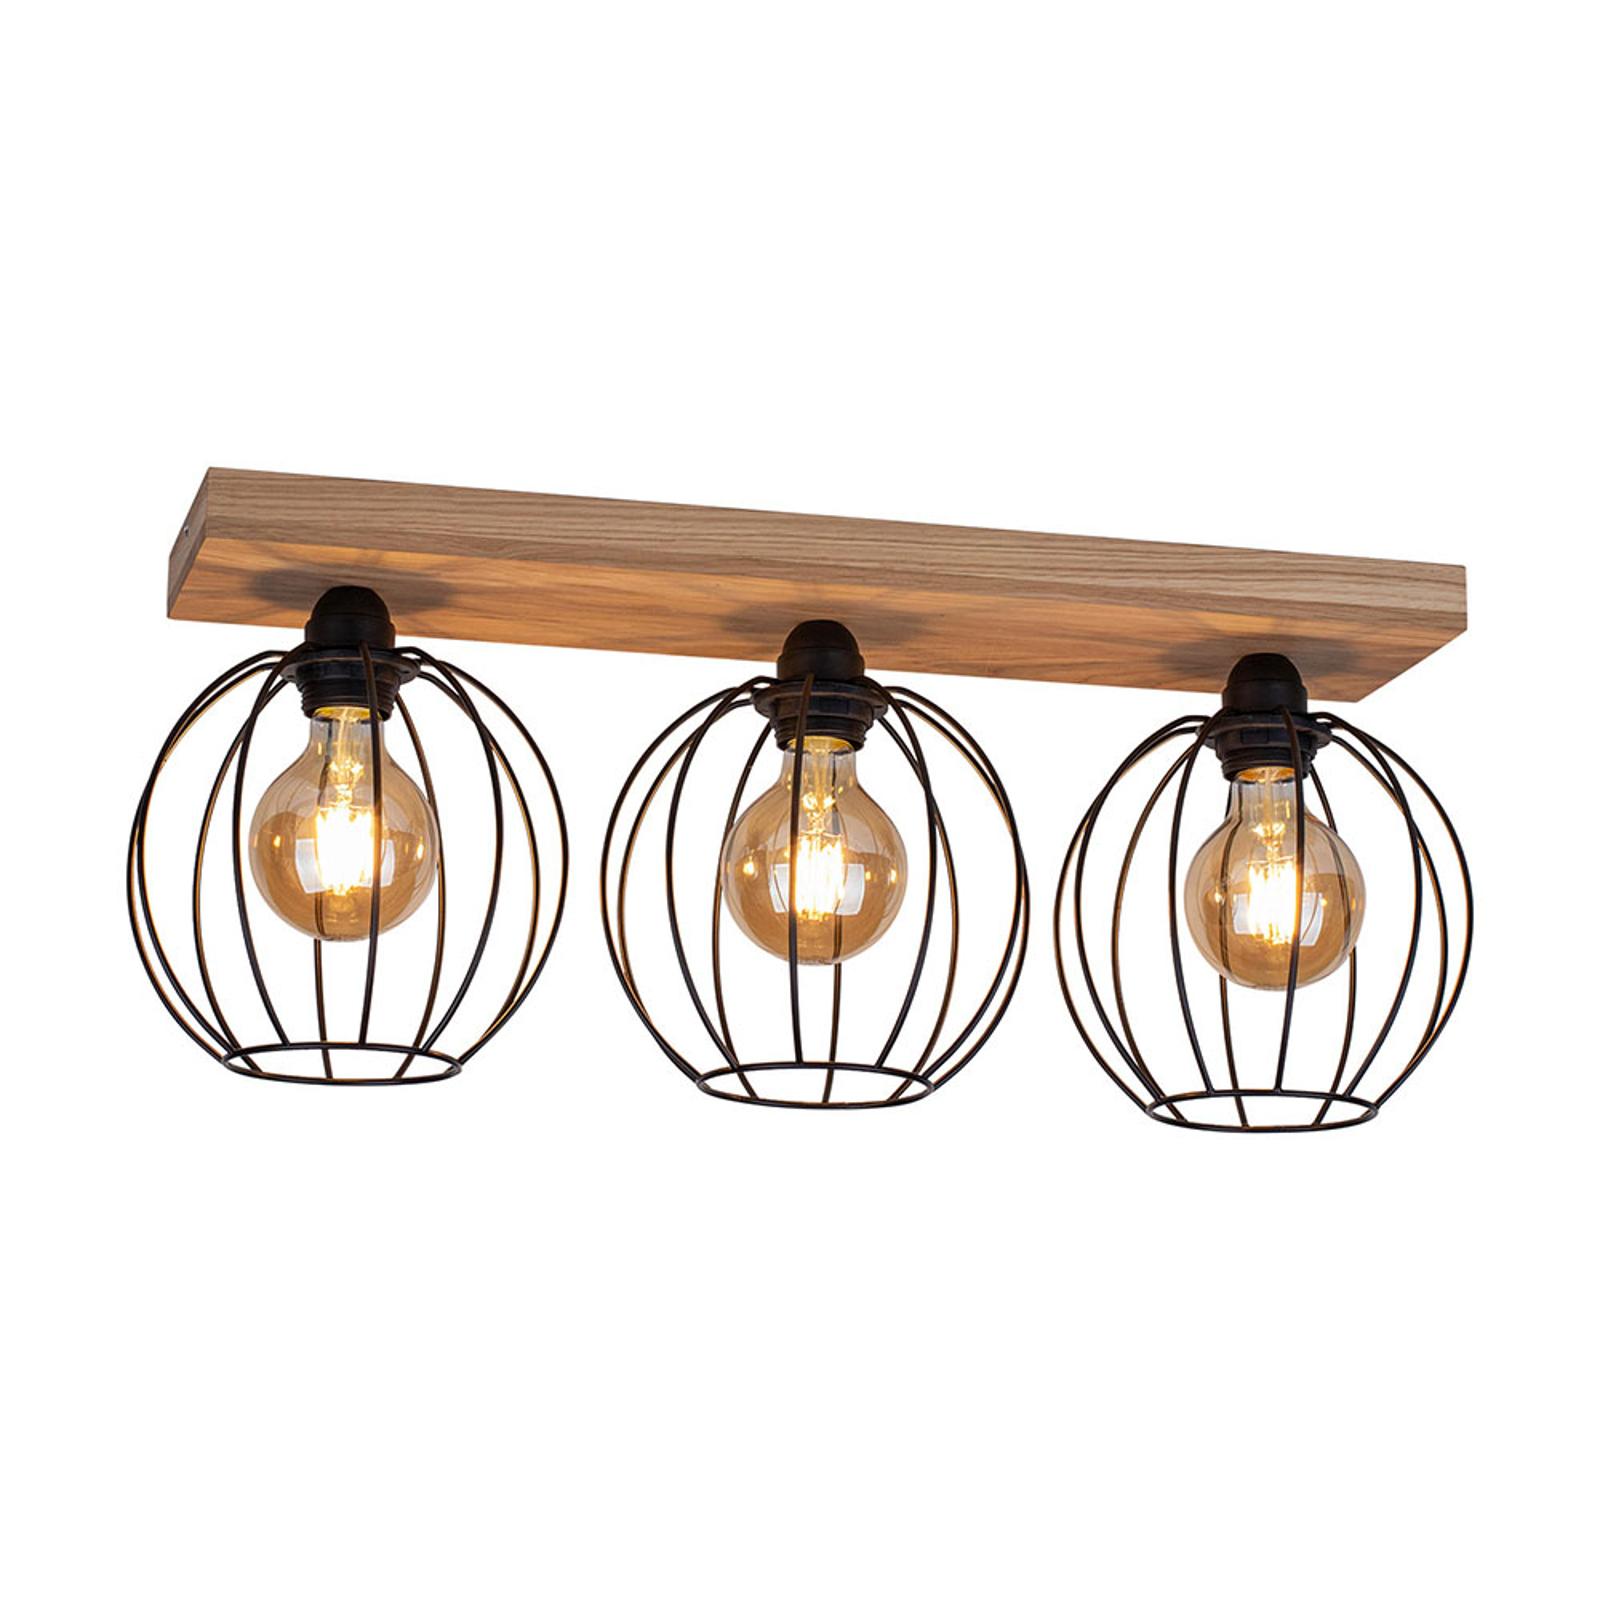 Lampa sufitowa Dorett, drewno dębowe, 3-pkt.